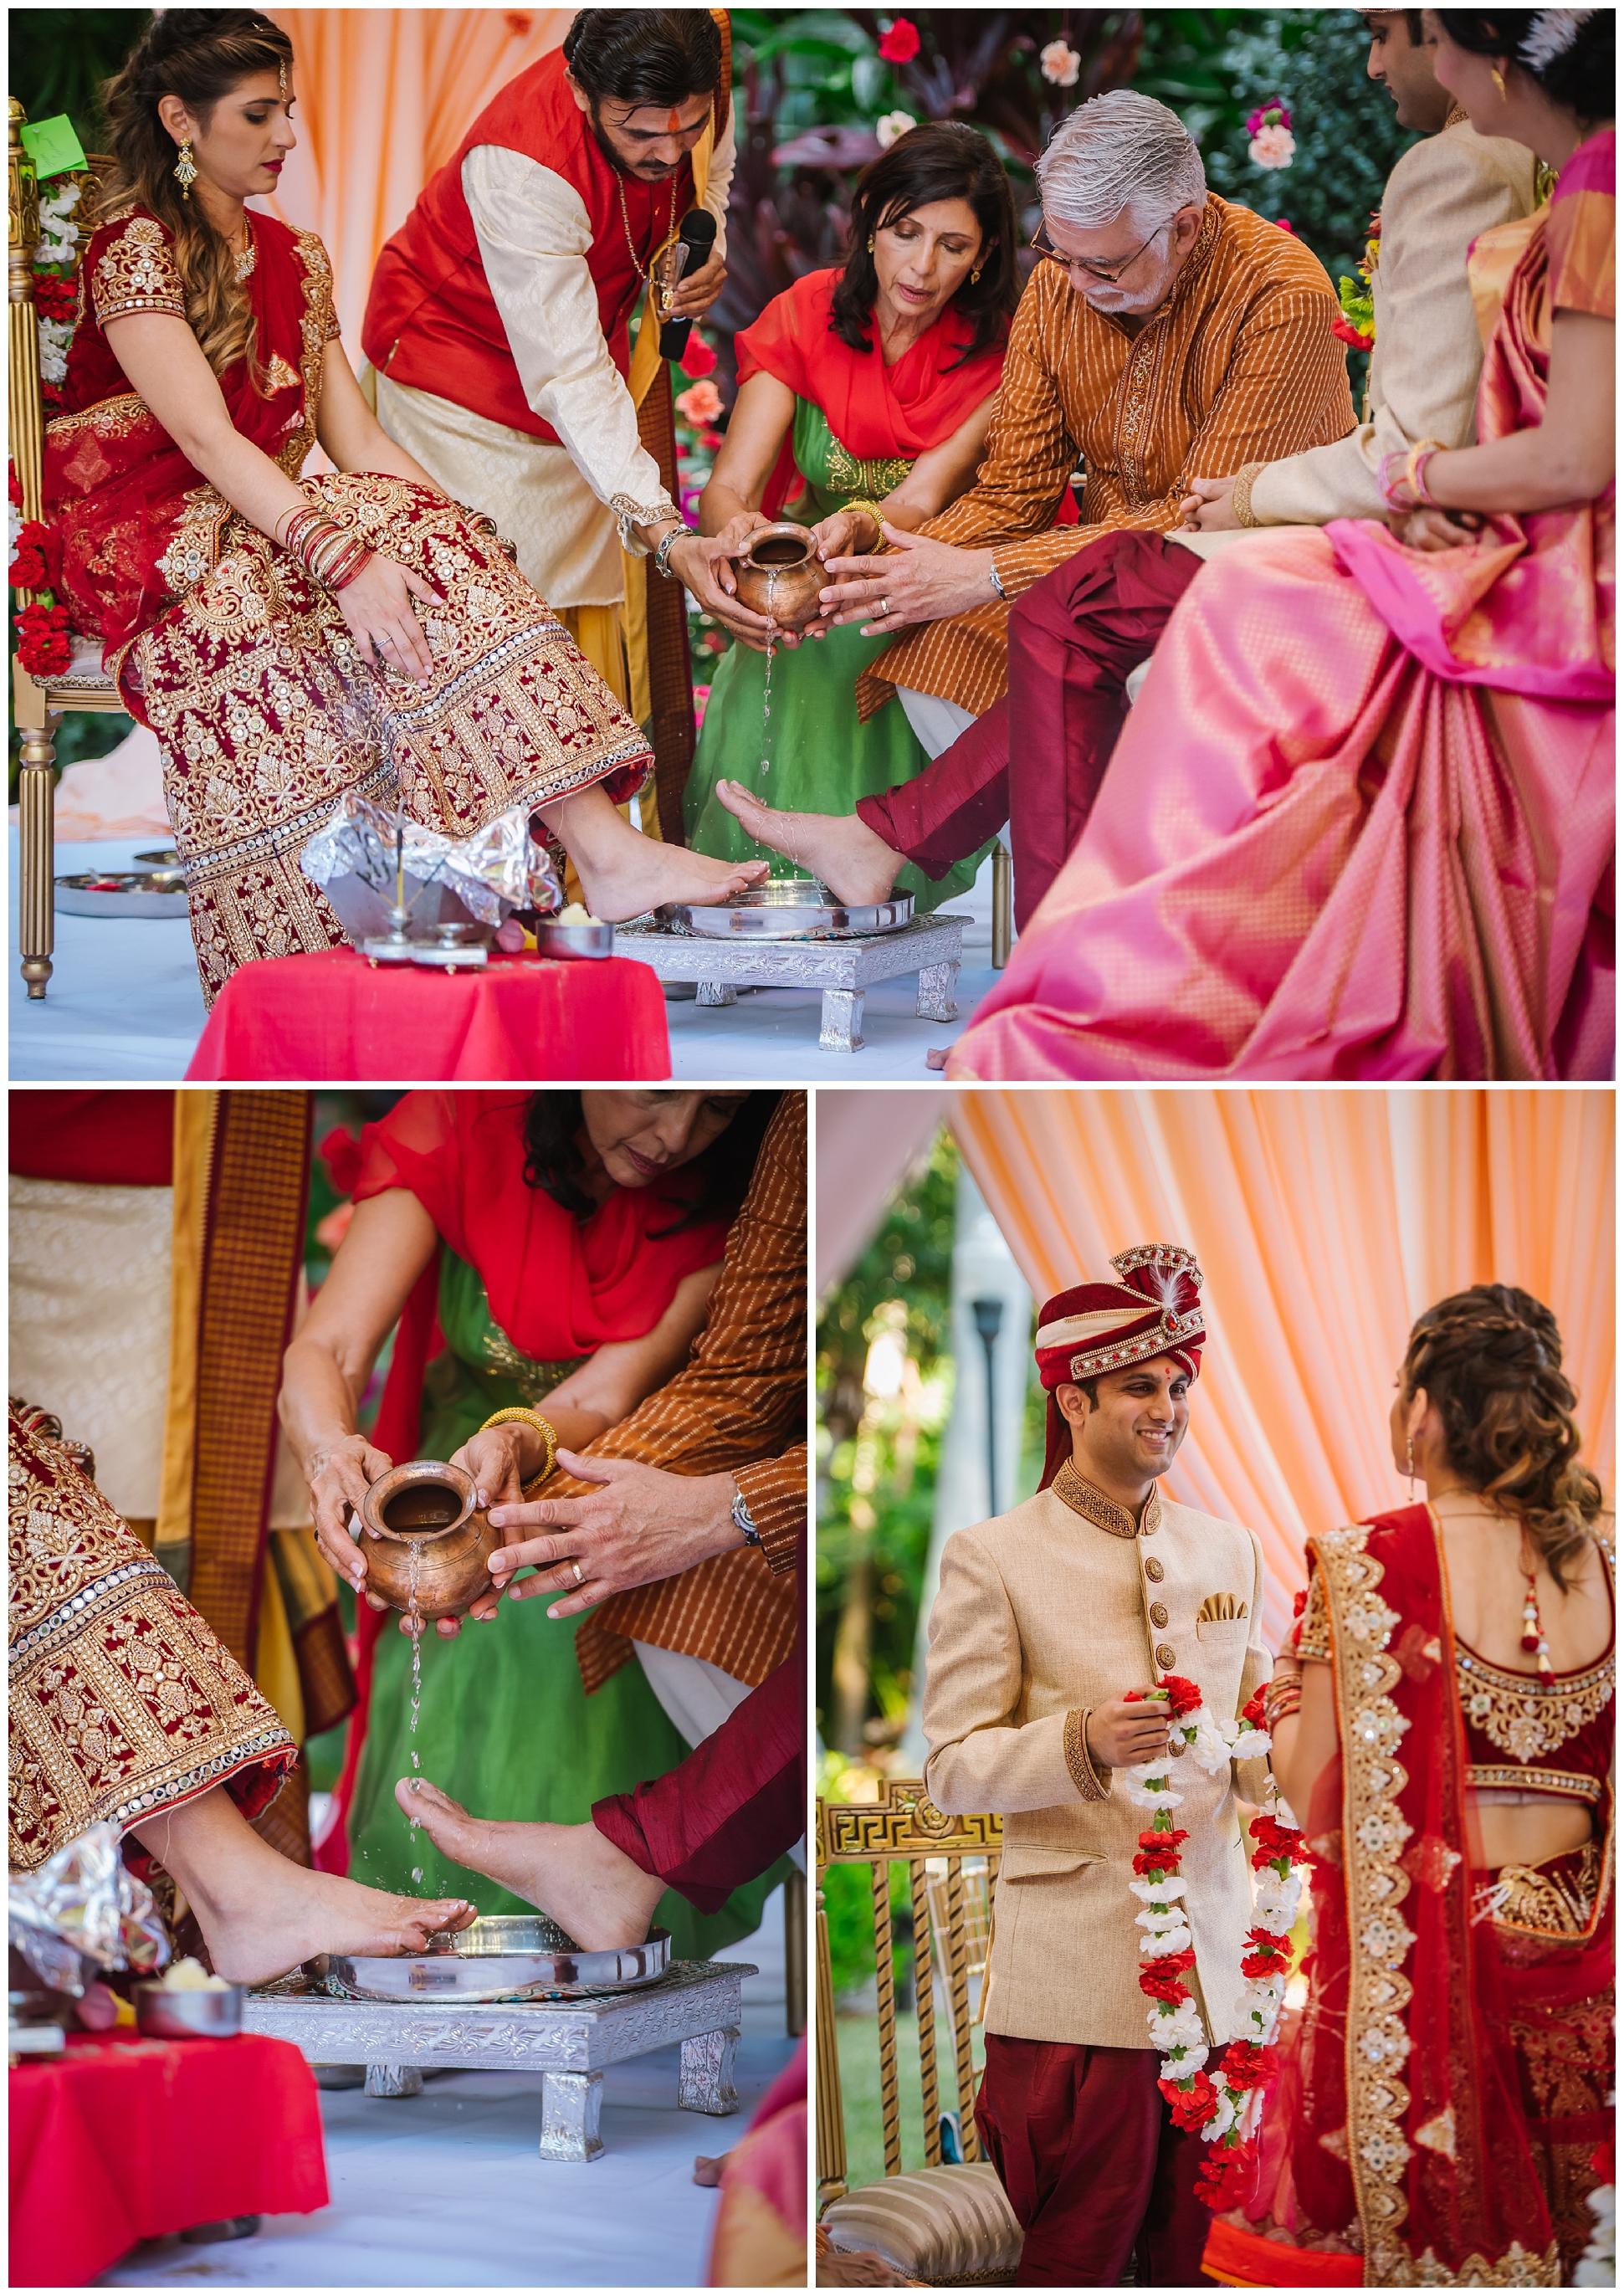 St-pete-indian-wedding-photographer-barat-sunken-gardens_0110.jpg